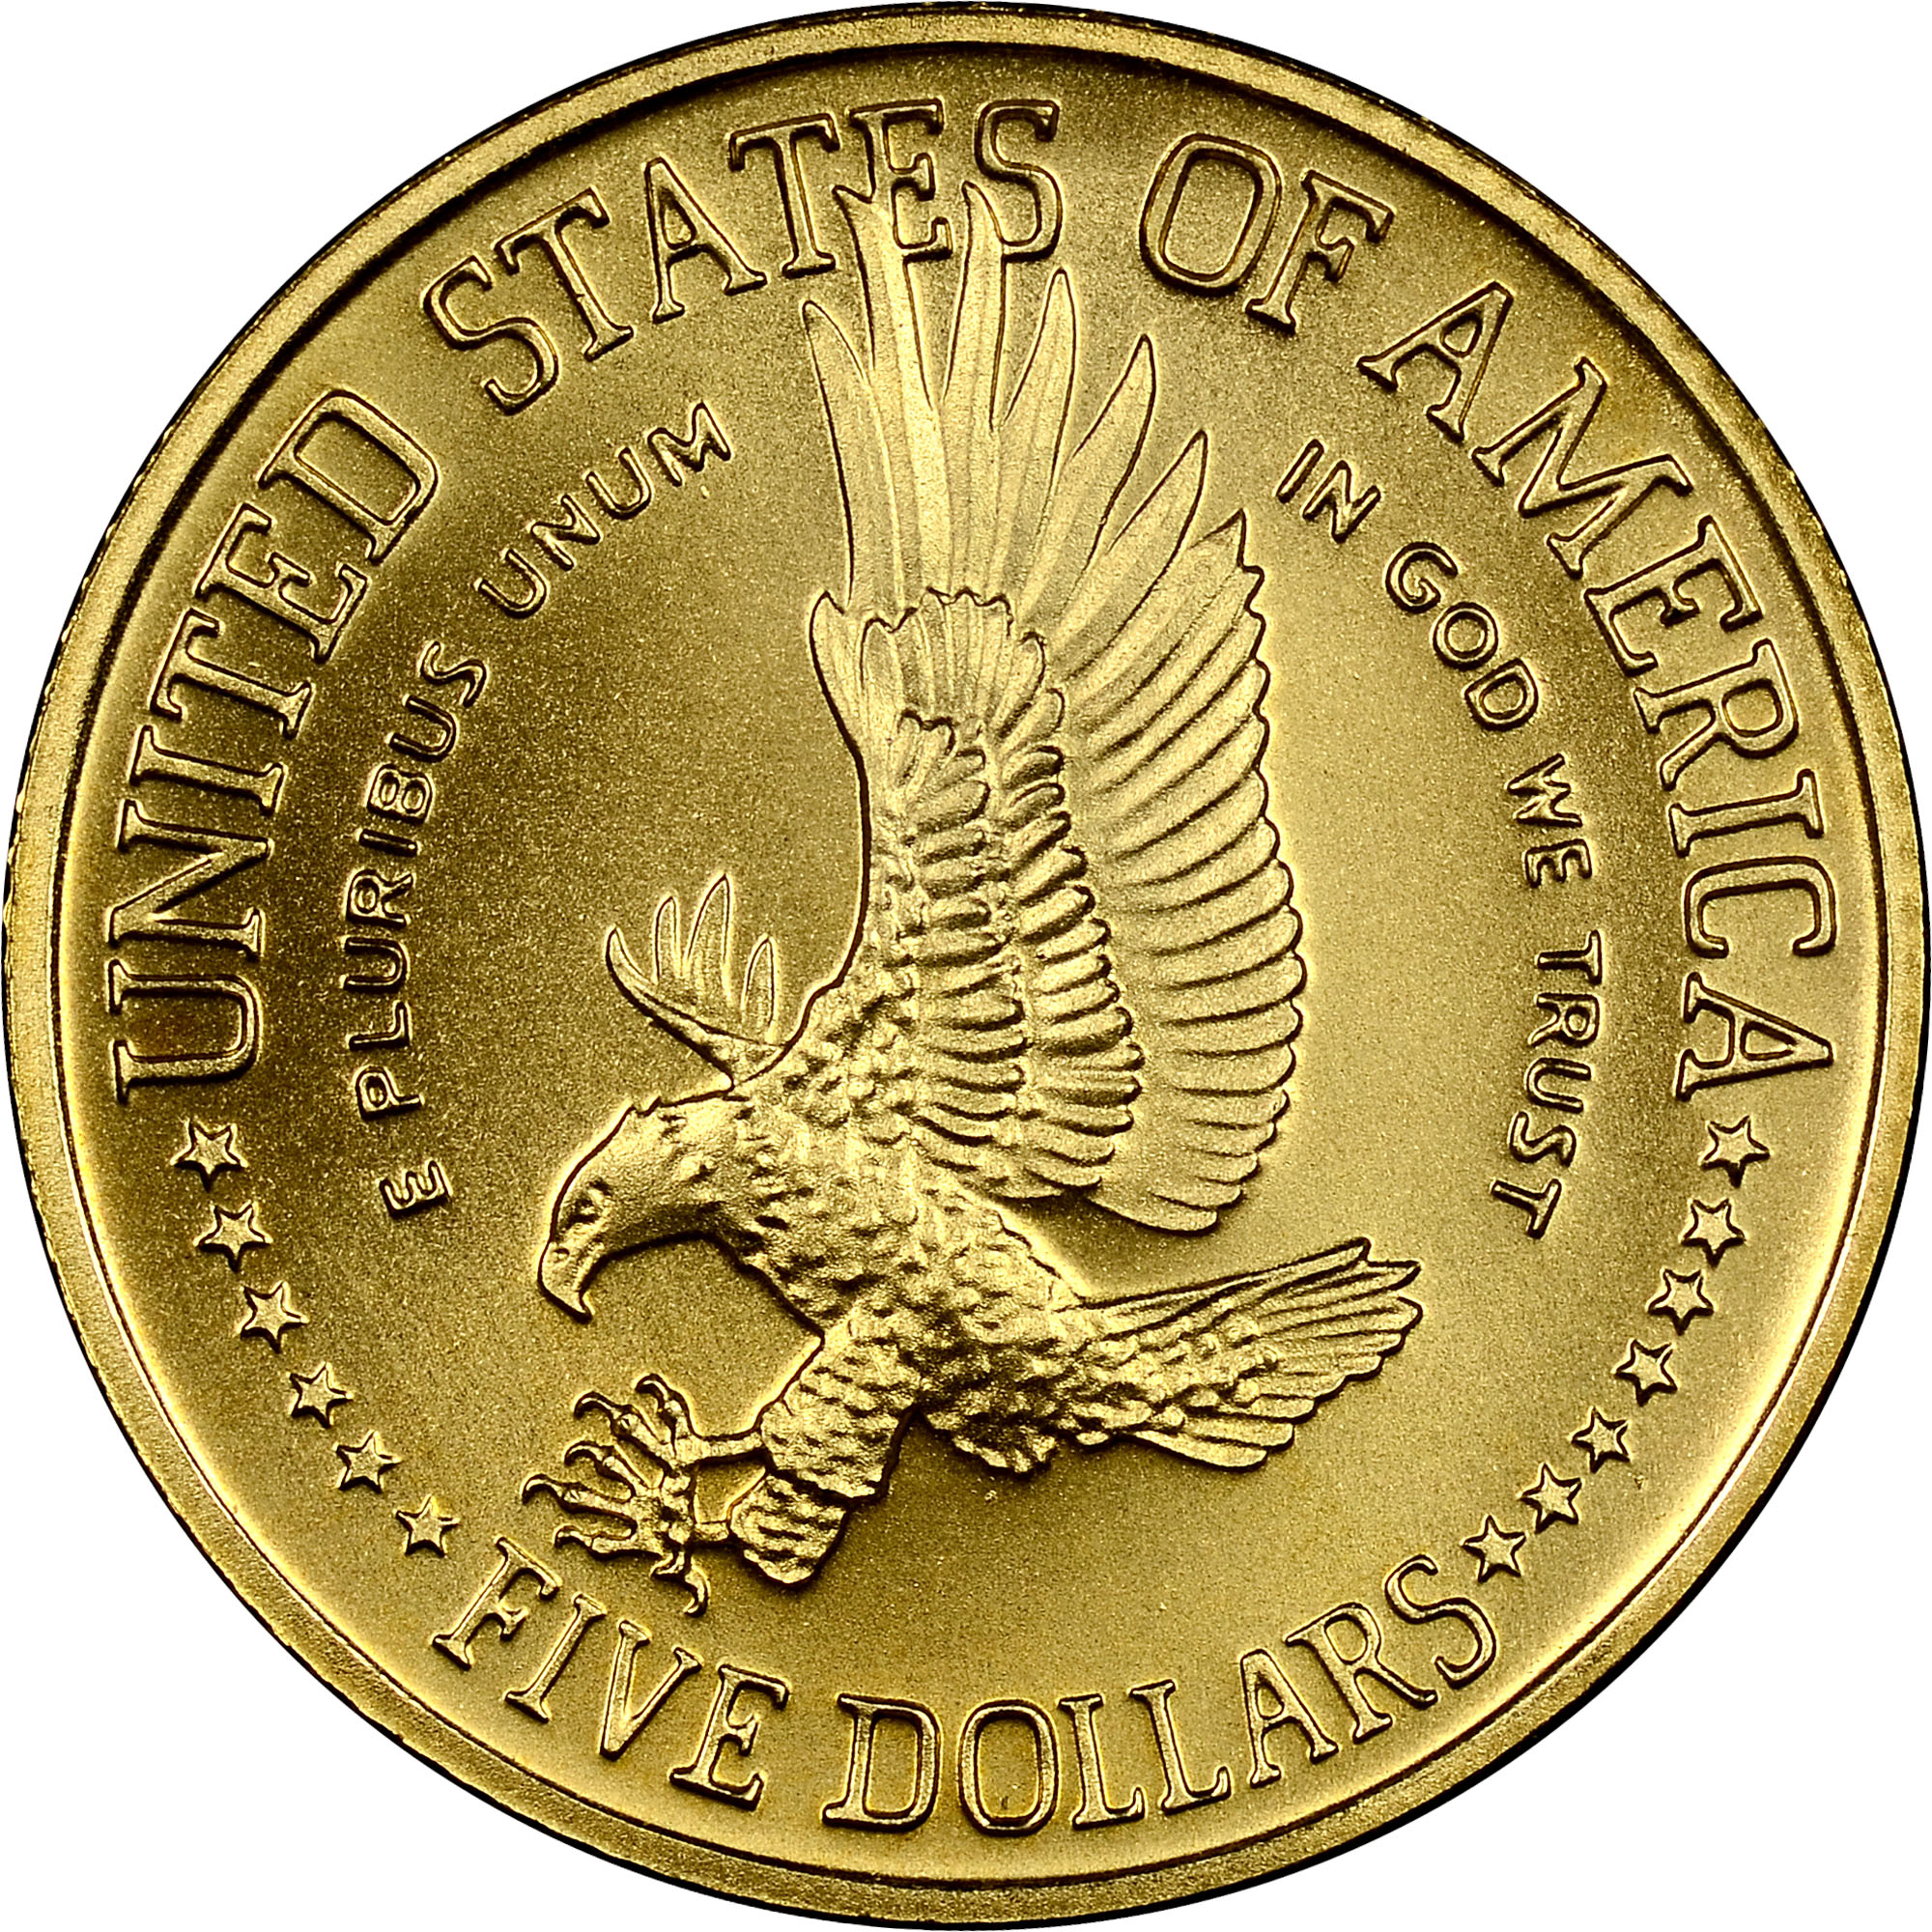 1986 statue of liberty centennial coin